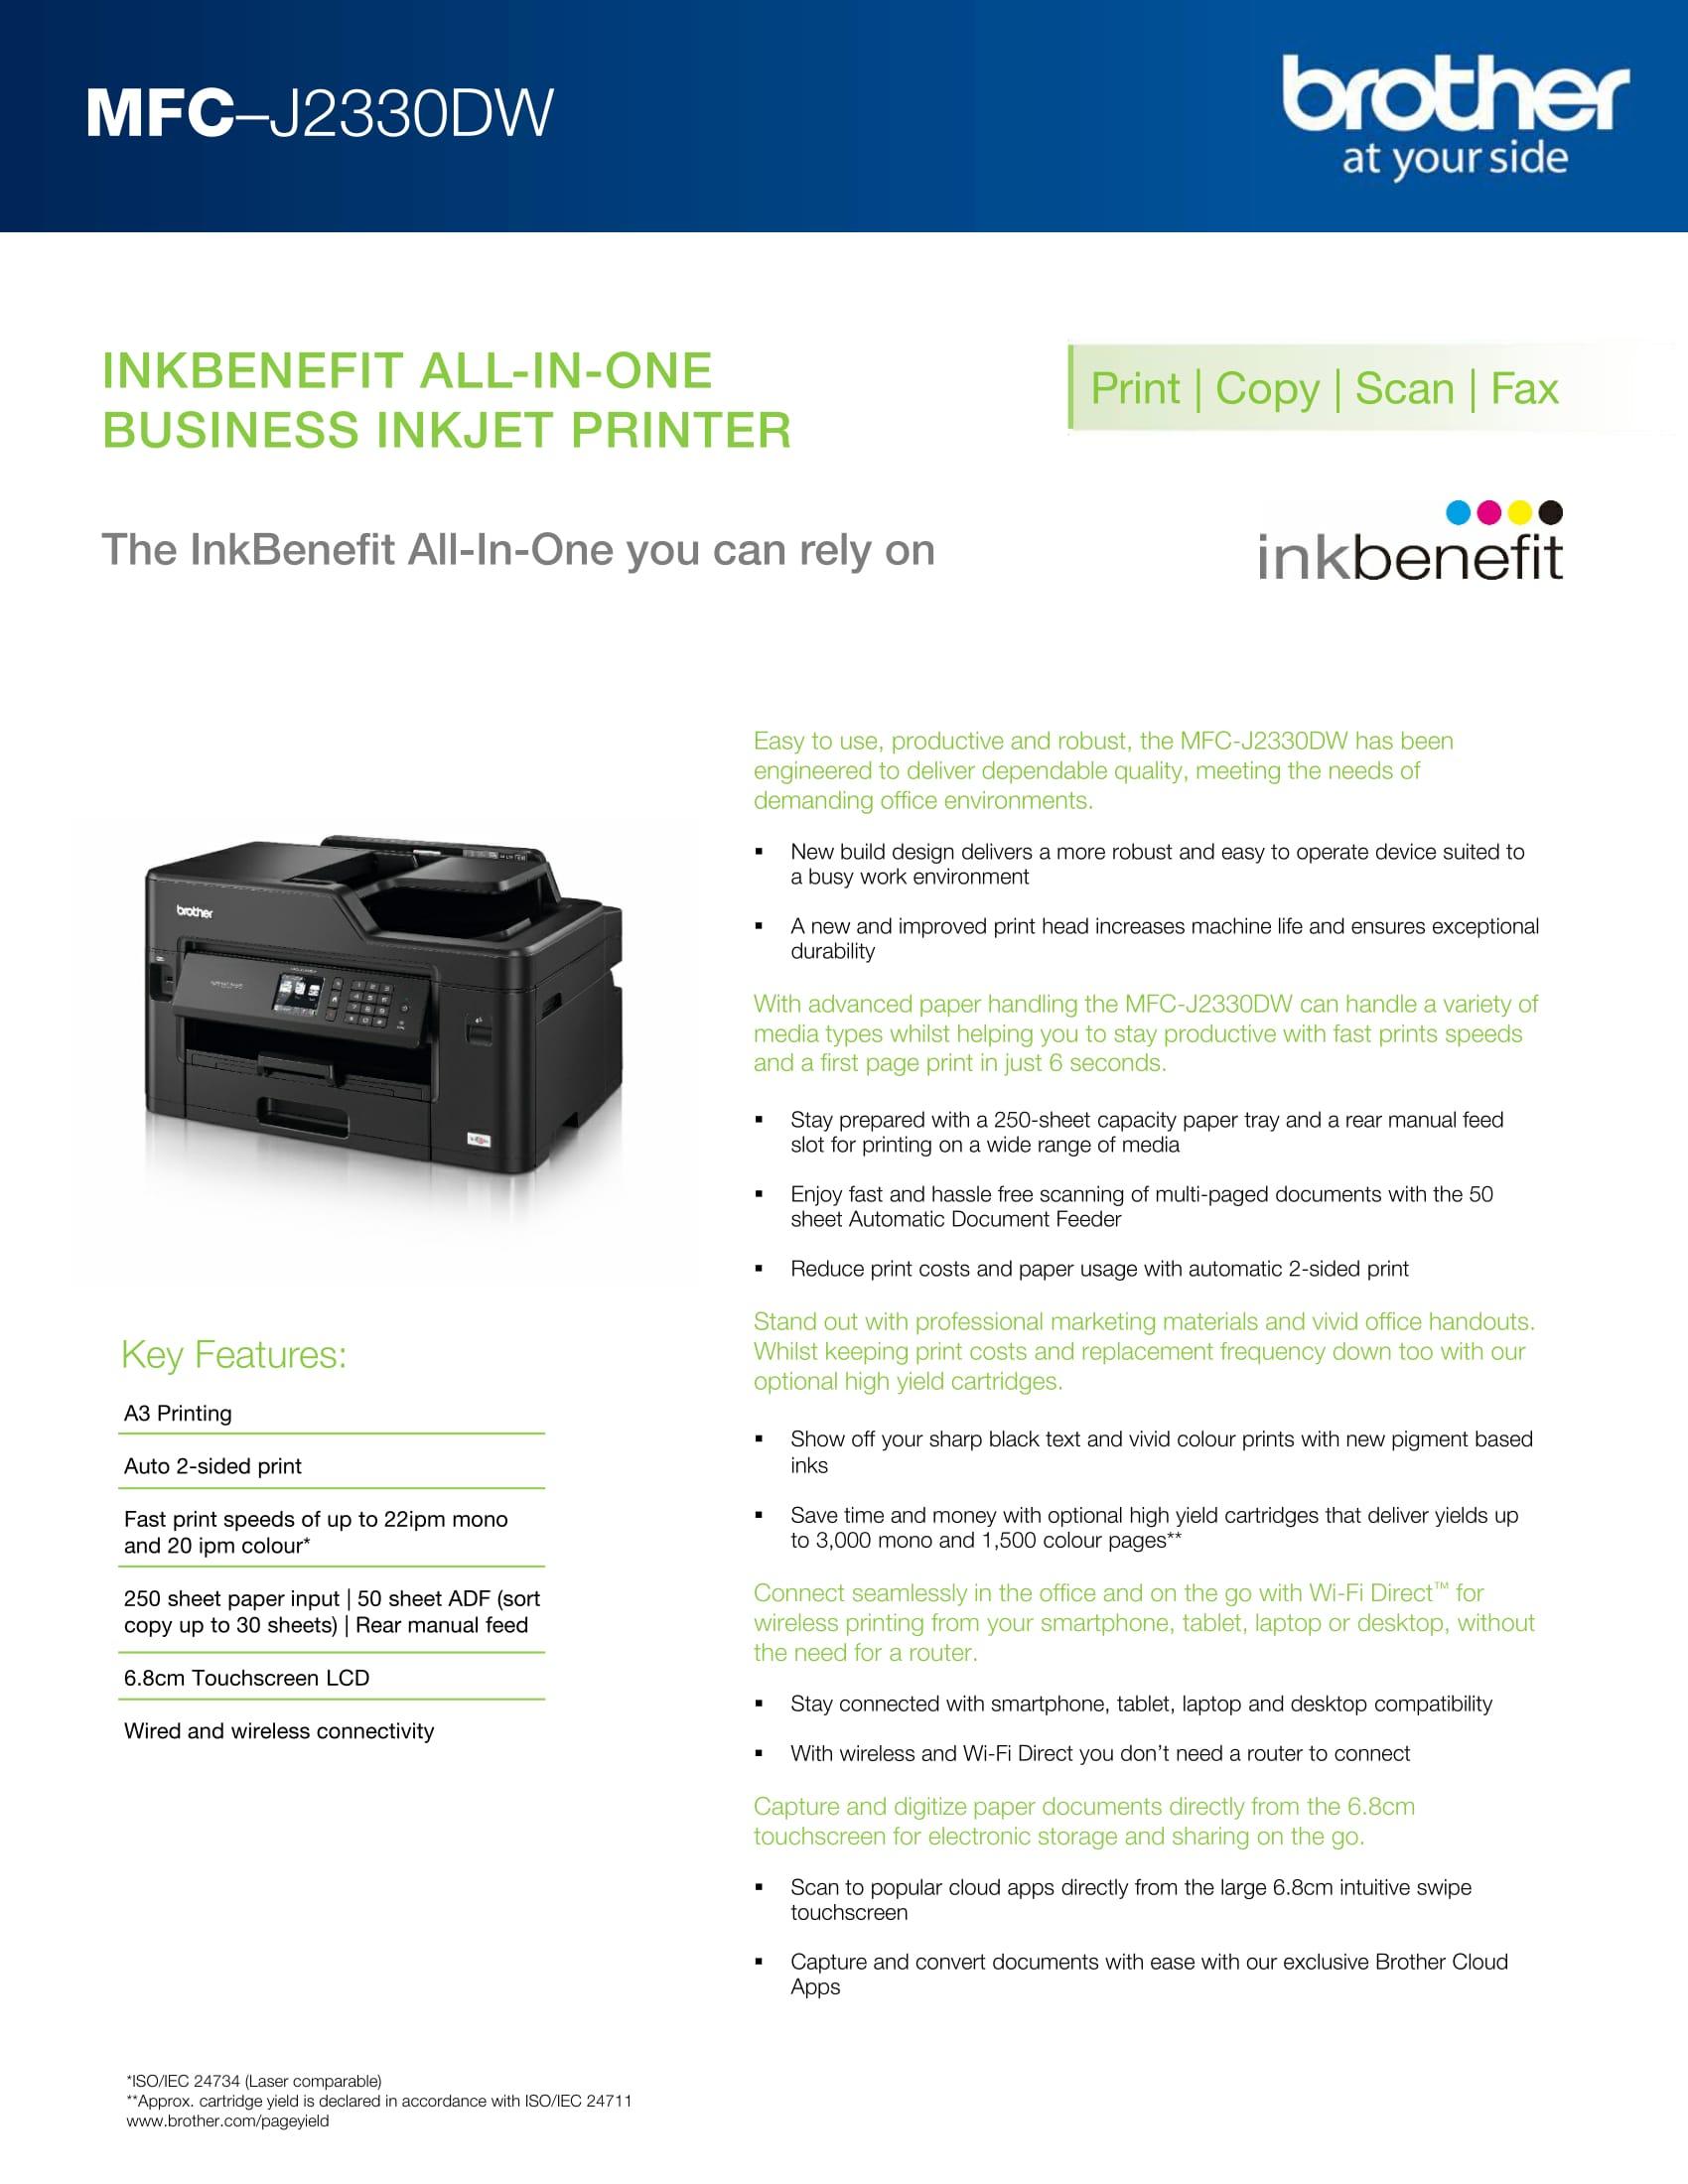 Brother MFC-J2330DW InkBenefit